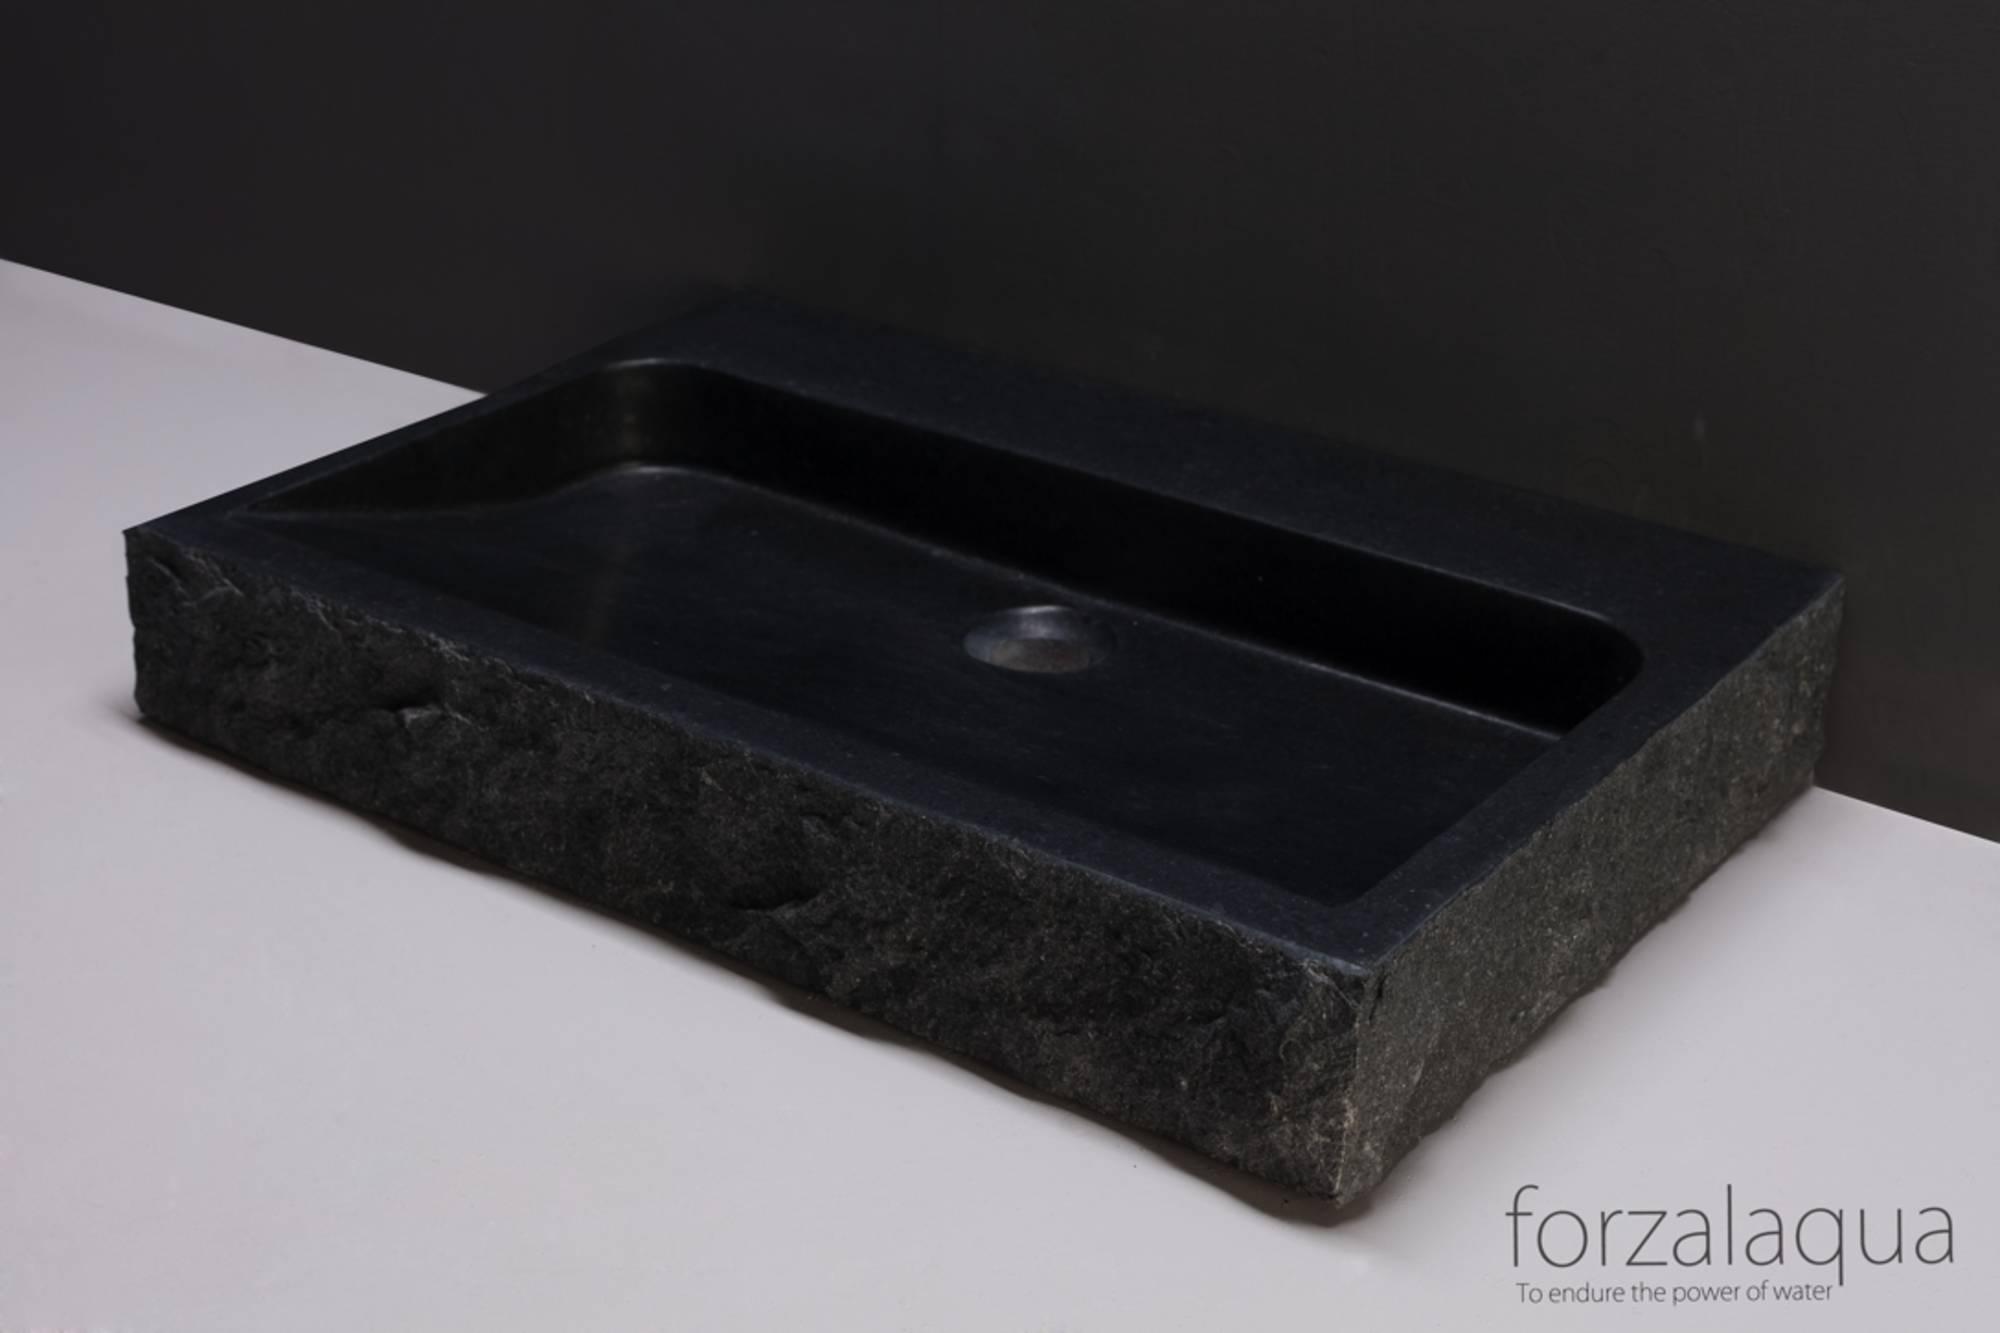 Forzalaqua Palermo wastafel 80,5x51,5x9 cm Graniet gekapt